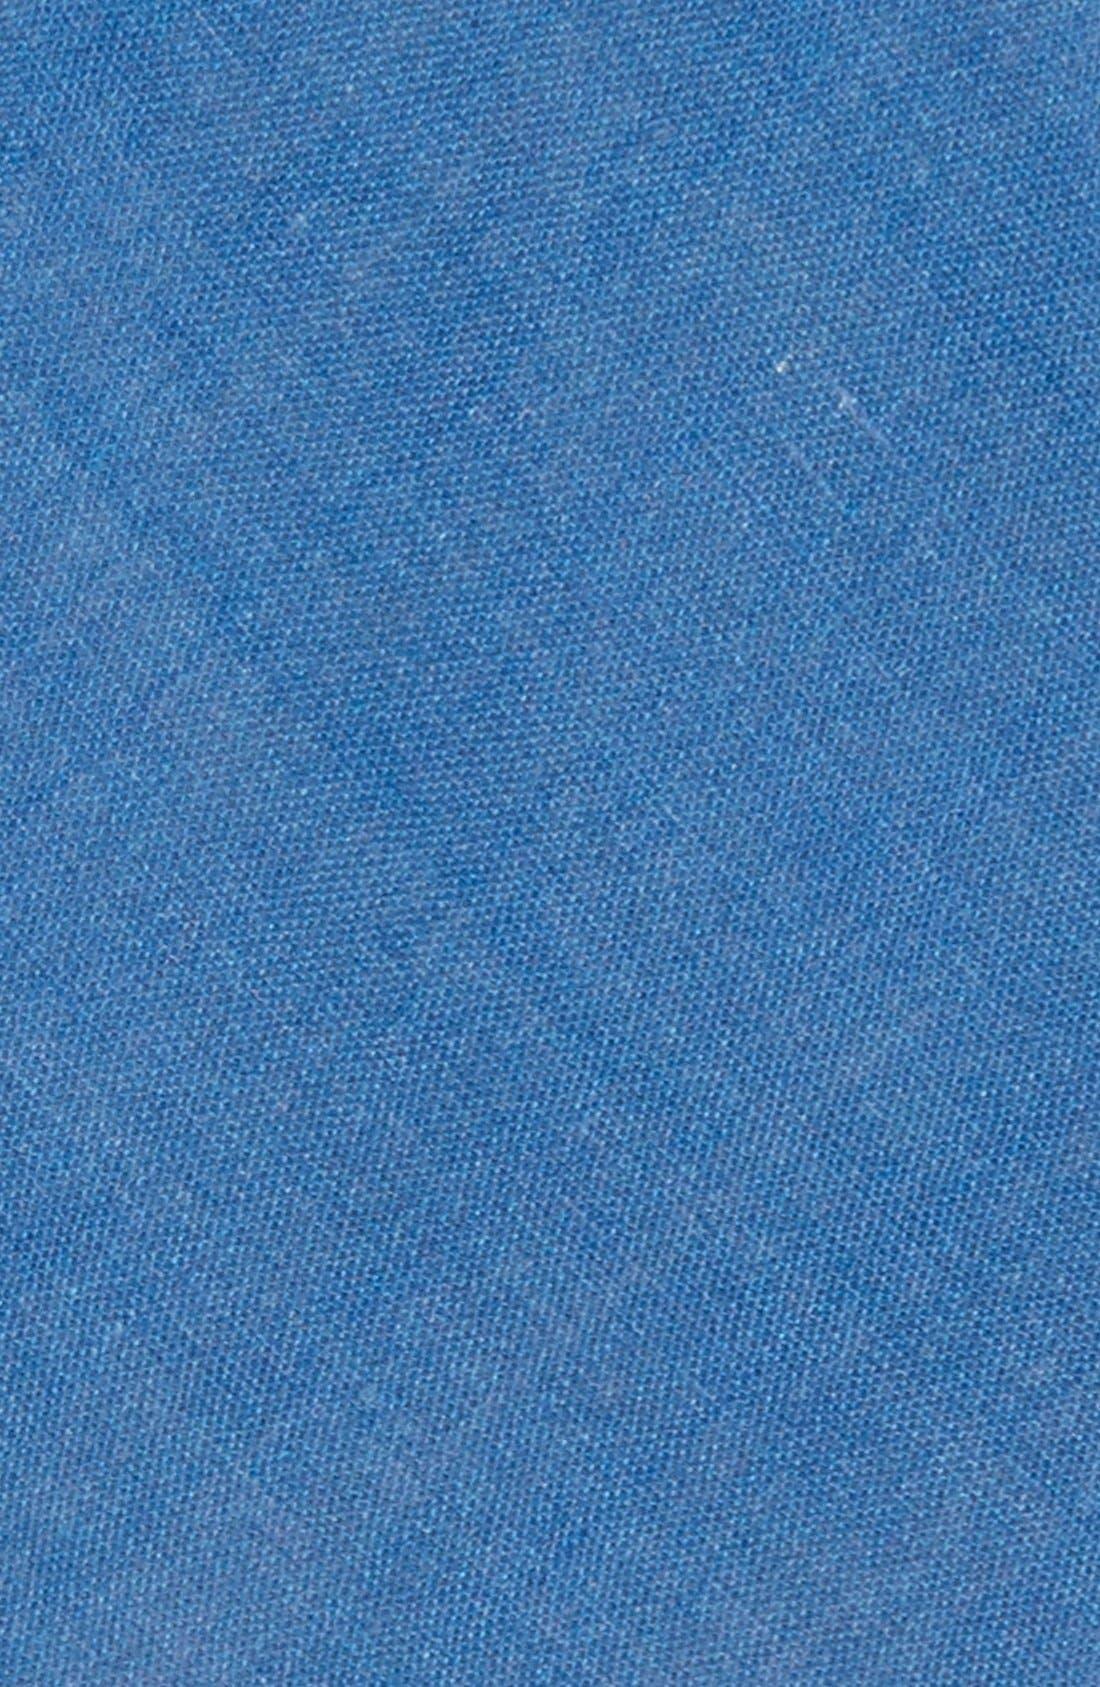 Alternate Image 2  - EDIT by The Tie Bar Solid Linen Tie (Nordstrom Exclusive)